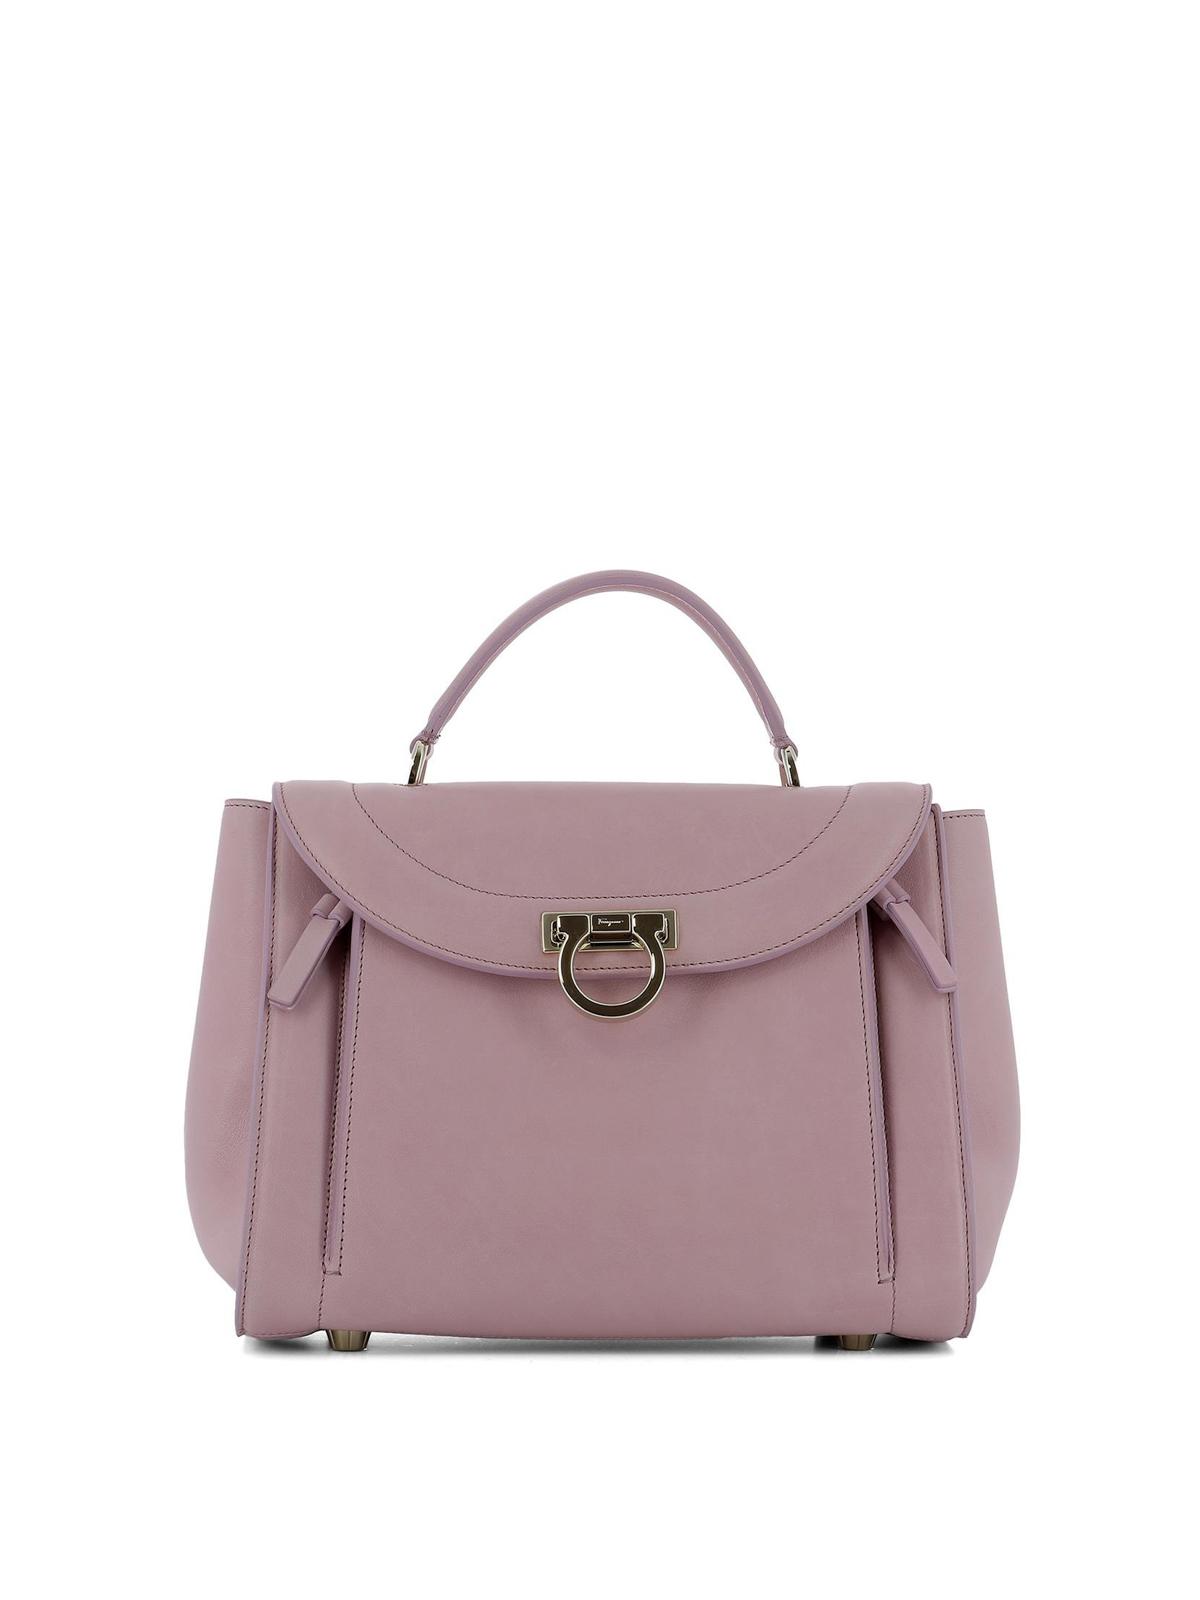 sofia rainbow small pink handbag by salvatore ferragamo bowling bags ikrix. Black Bedroom Furniture Sets. Home Design Ideas